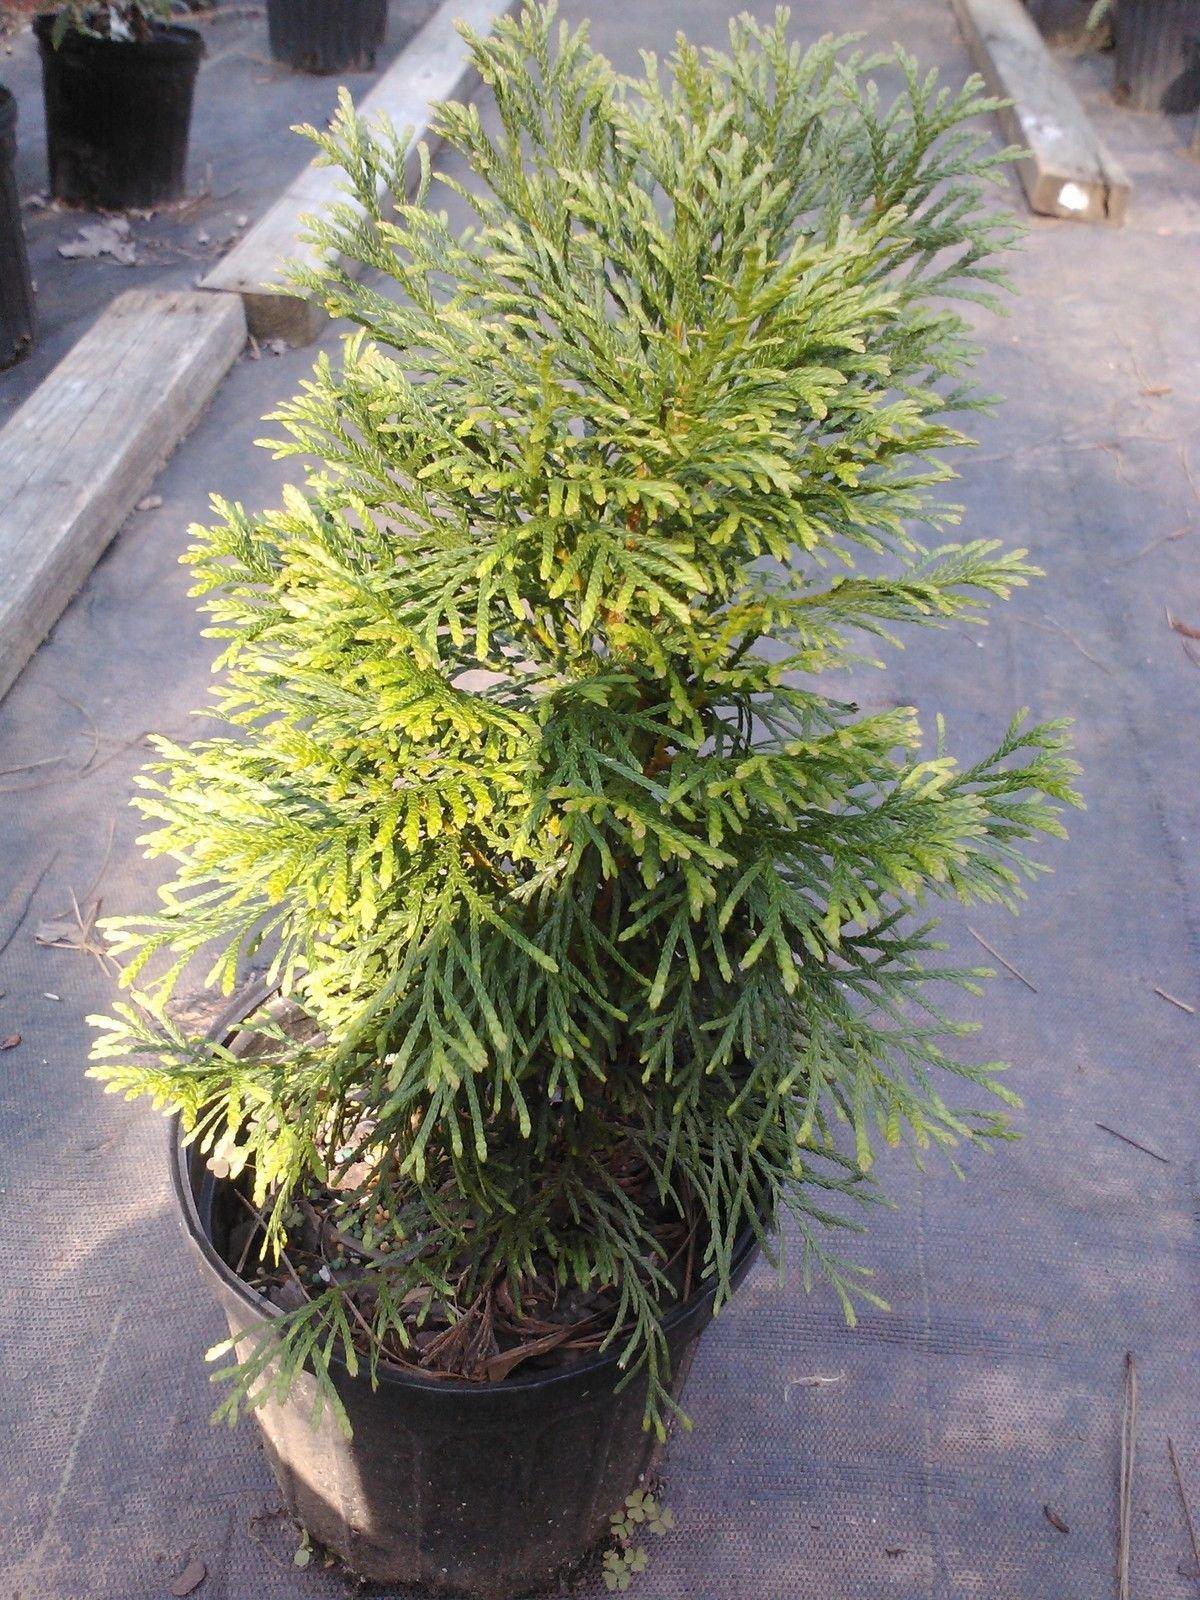 Dwarf Emerald Green Arborvitae Compact Evergreen Great For Colder Zones Hydrangeas Shrub